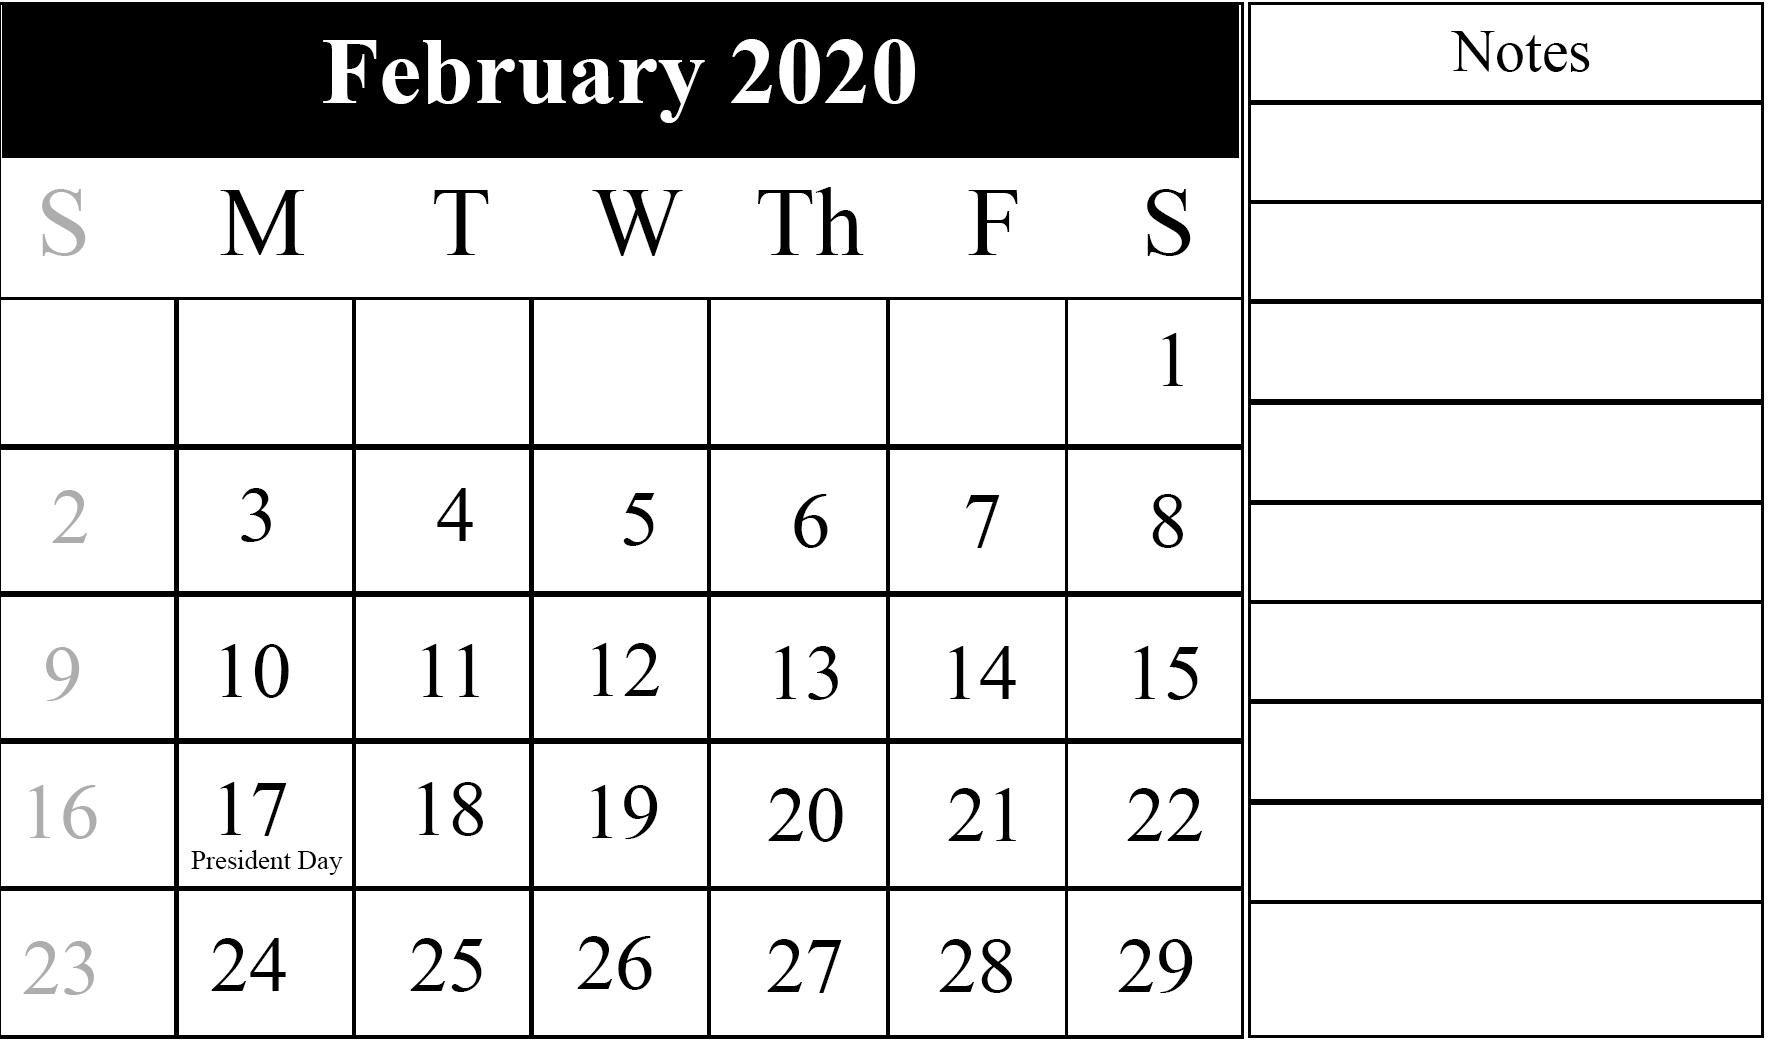 February Calendar 2020 Free Printable Template Pdf Word Excel pertaining to Employee Attendance Calendar 2020 Prntable